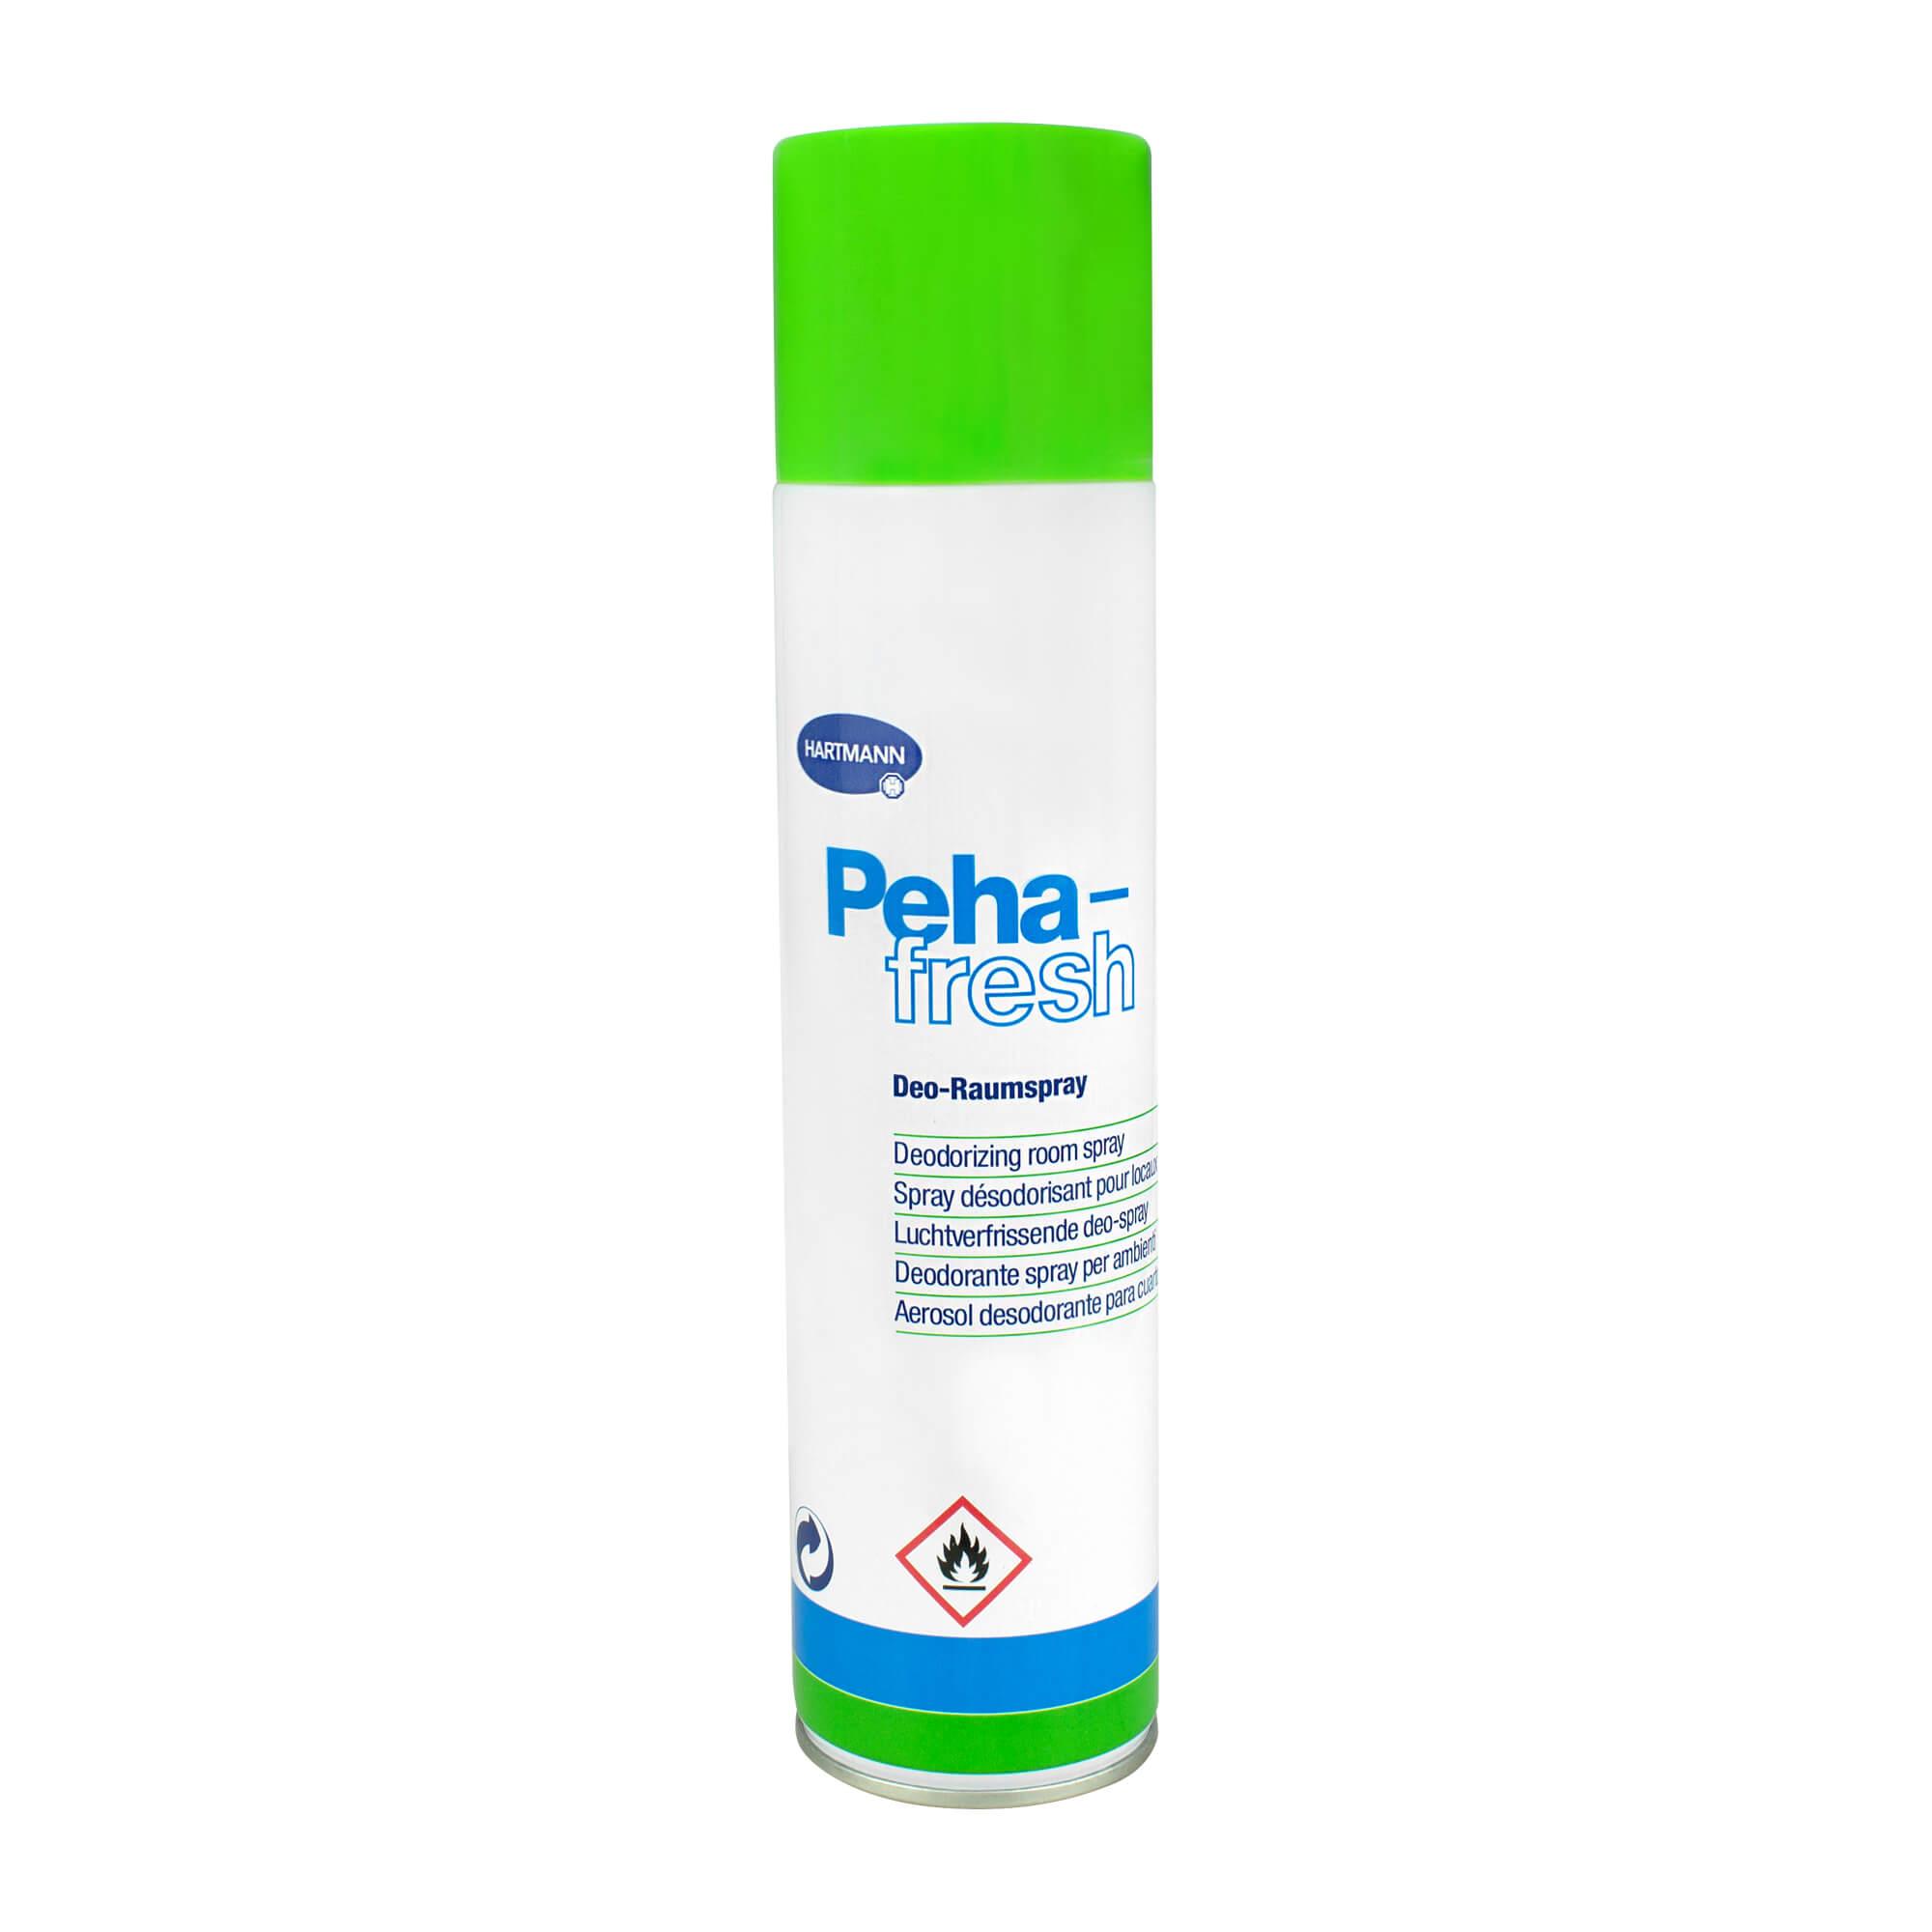 Peha-fresh Deo Raumspray